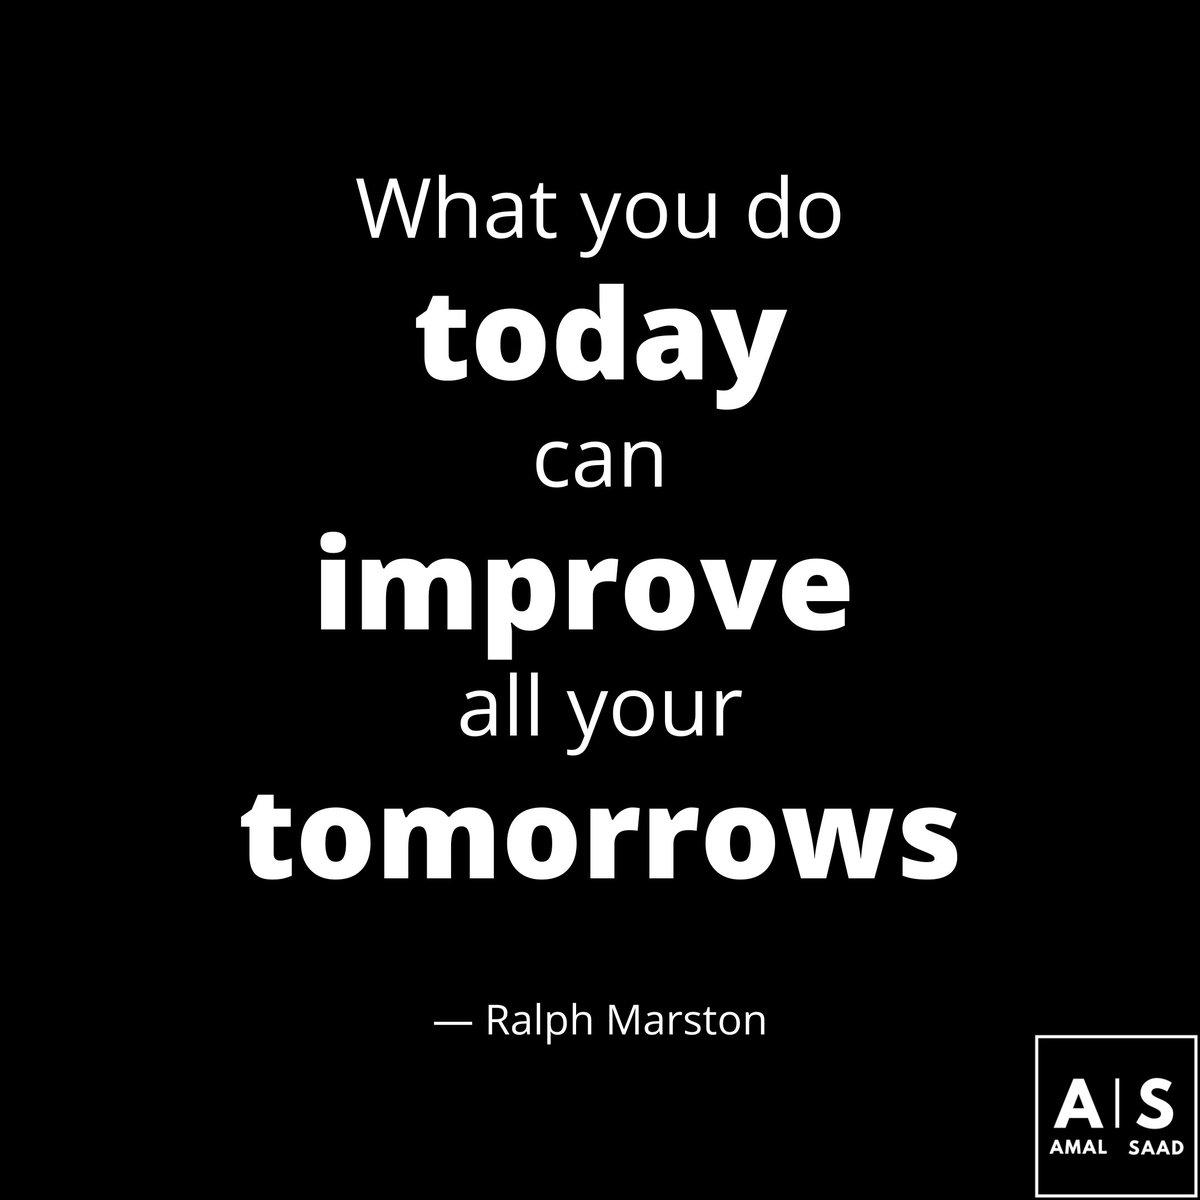 """What you do #today can #improve all your tomorrows."" - #ralphmarston . . . . . @AmalSaad28 @arts_innovation  #millionairementor #millionairemindset #workforyourself #myonboss #businesspassion #gottastayfocused #businessquote #entrepreneuriallife #TuesdayMotivation #amalsaadpic.twitter.com/BJUChmaywC"